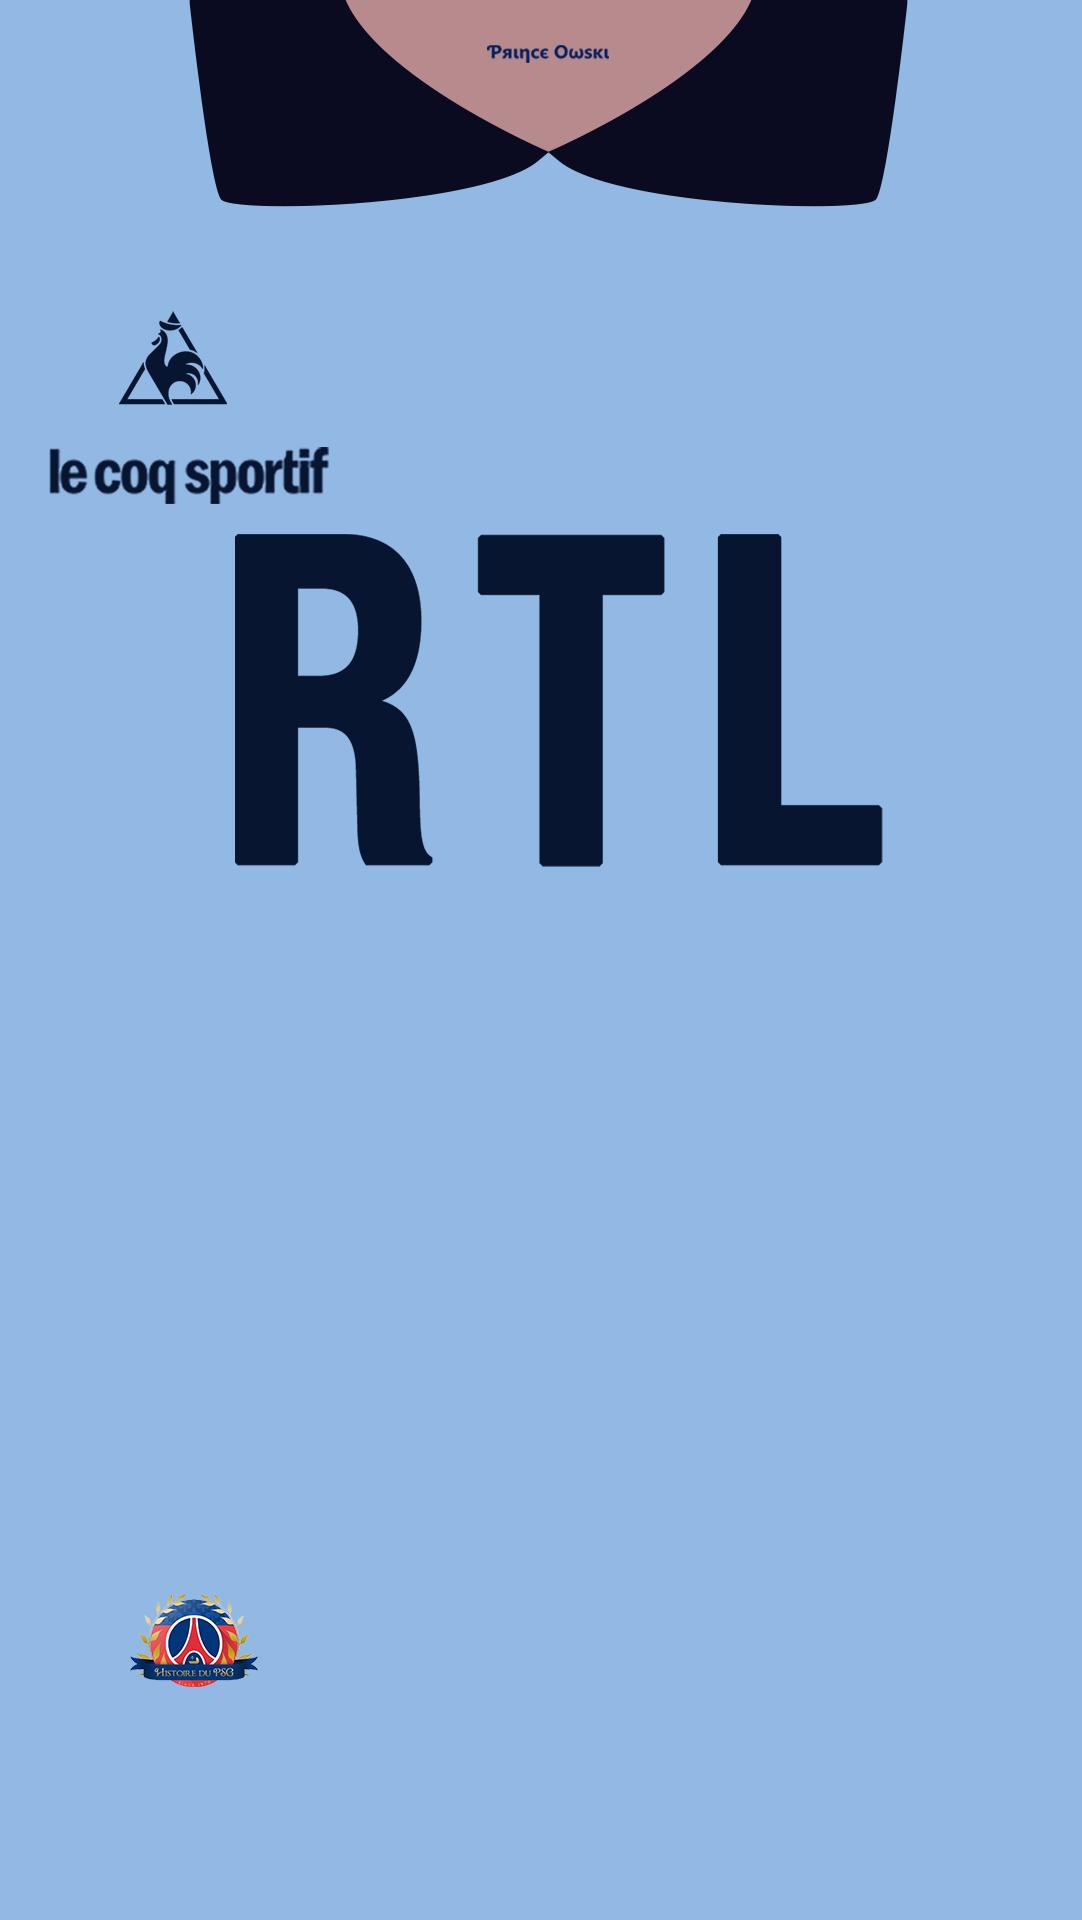 Fond d'ecran maillot PSG gardien pantellic